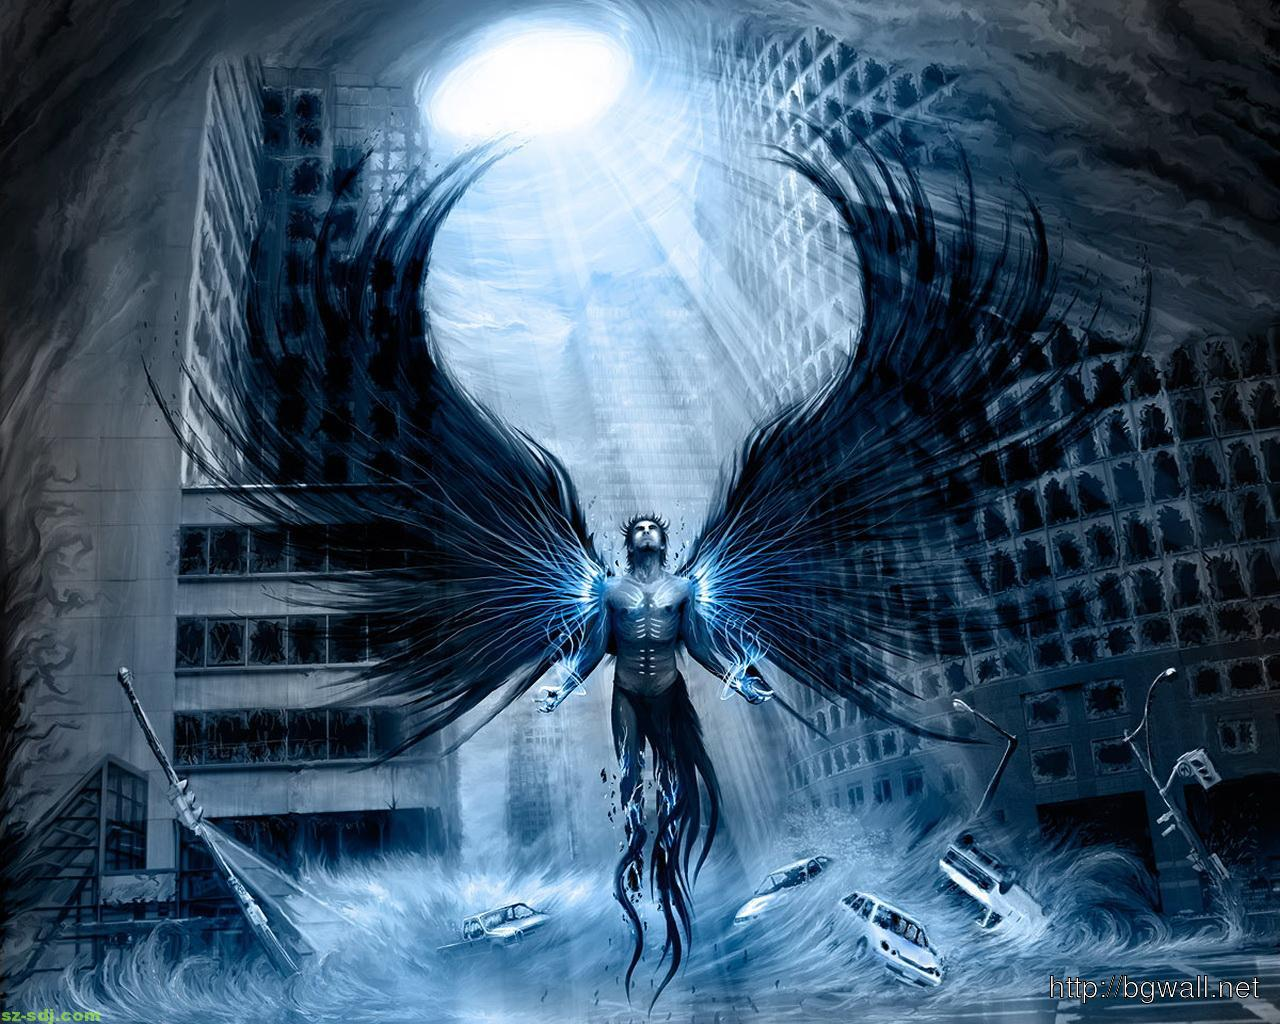 a-black-angel-hs-destroy-a-city-wallpaper-image-hd